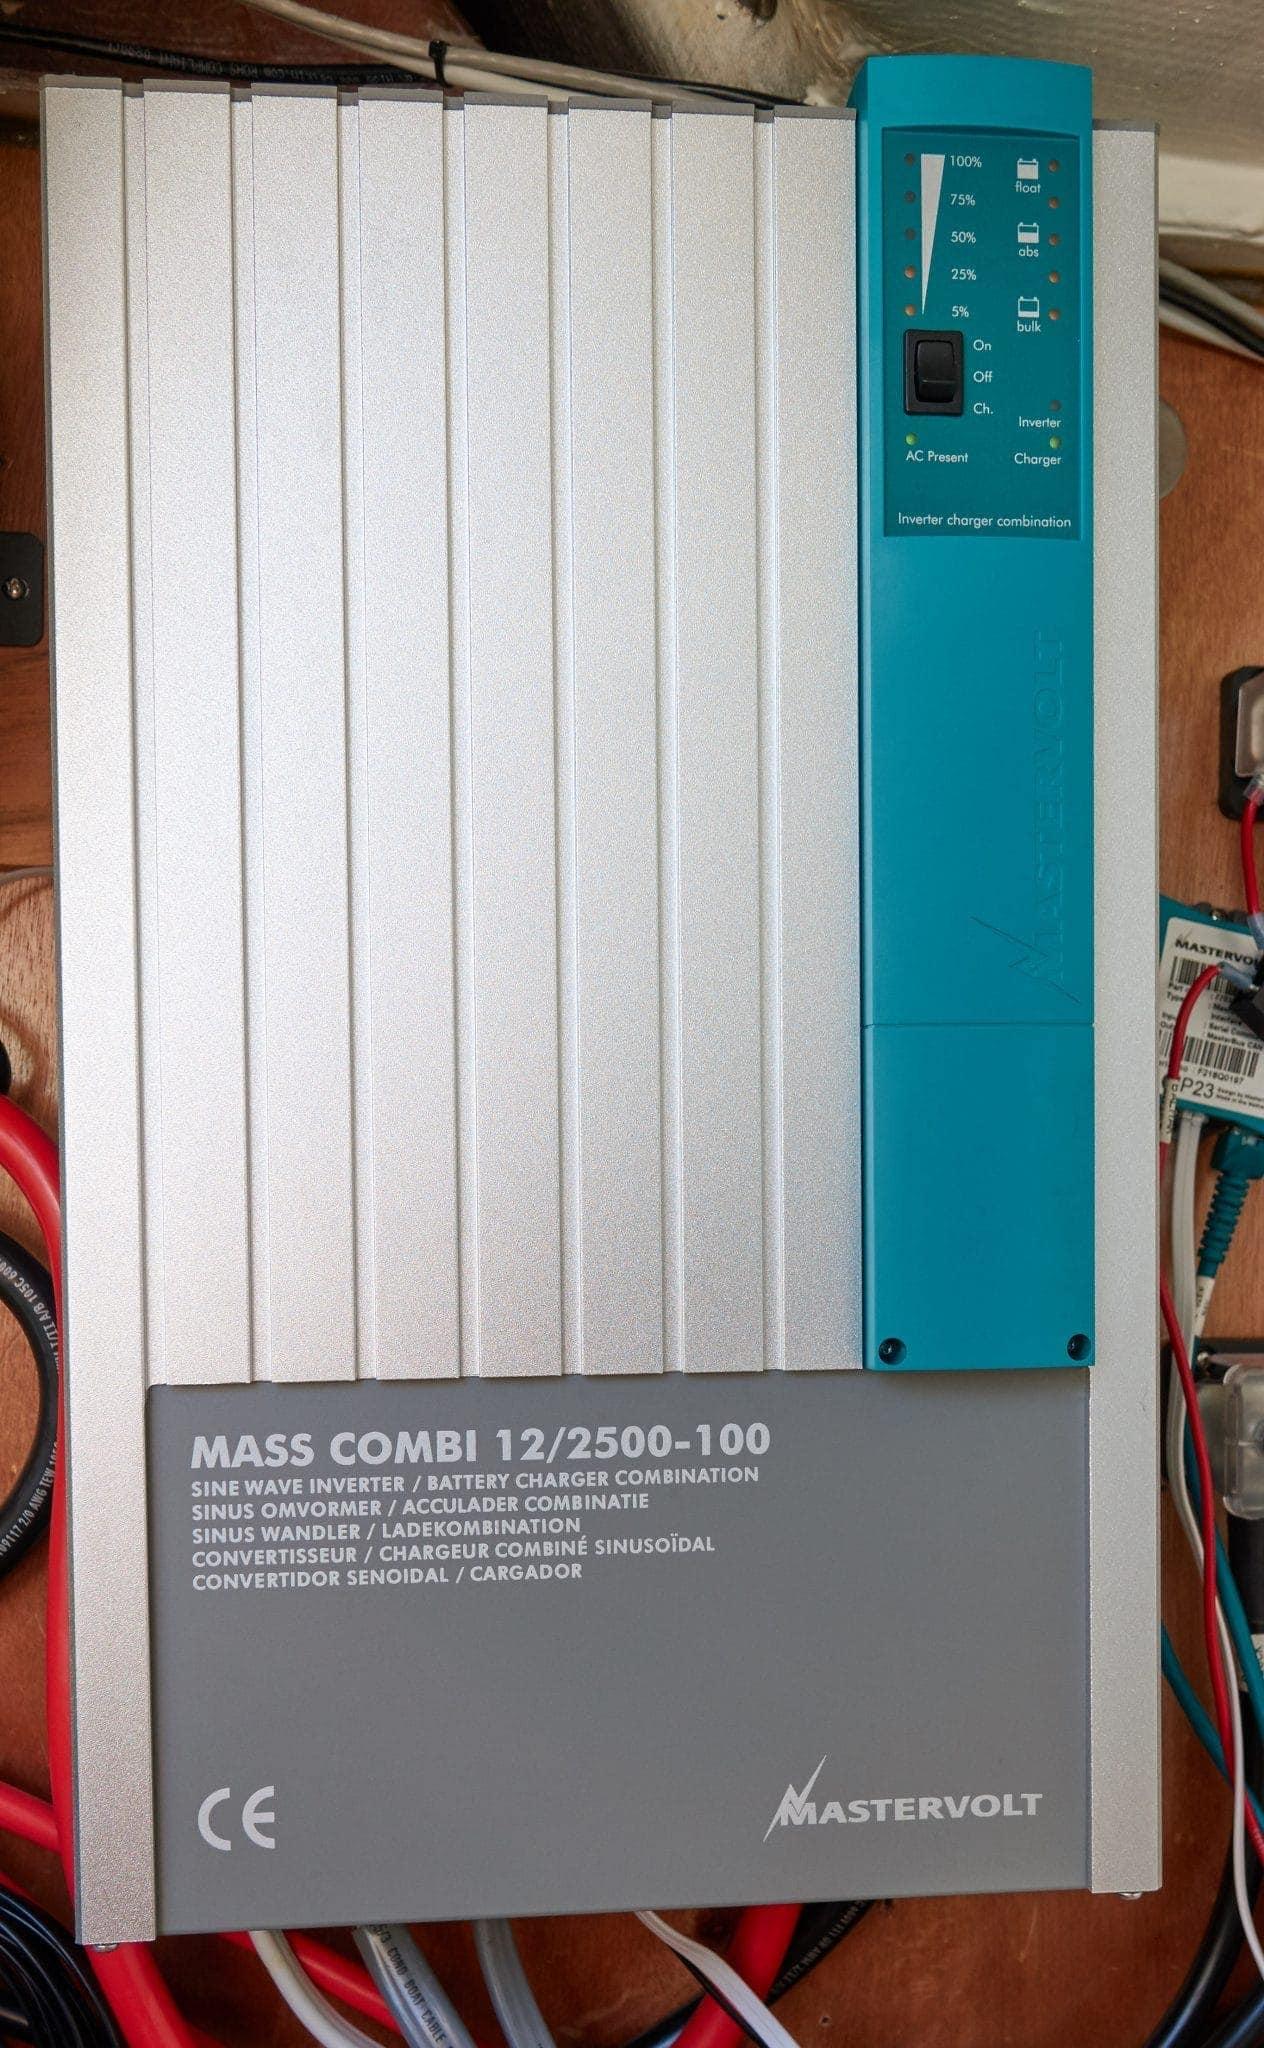 MasterVolt Mass Combi inverter